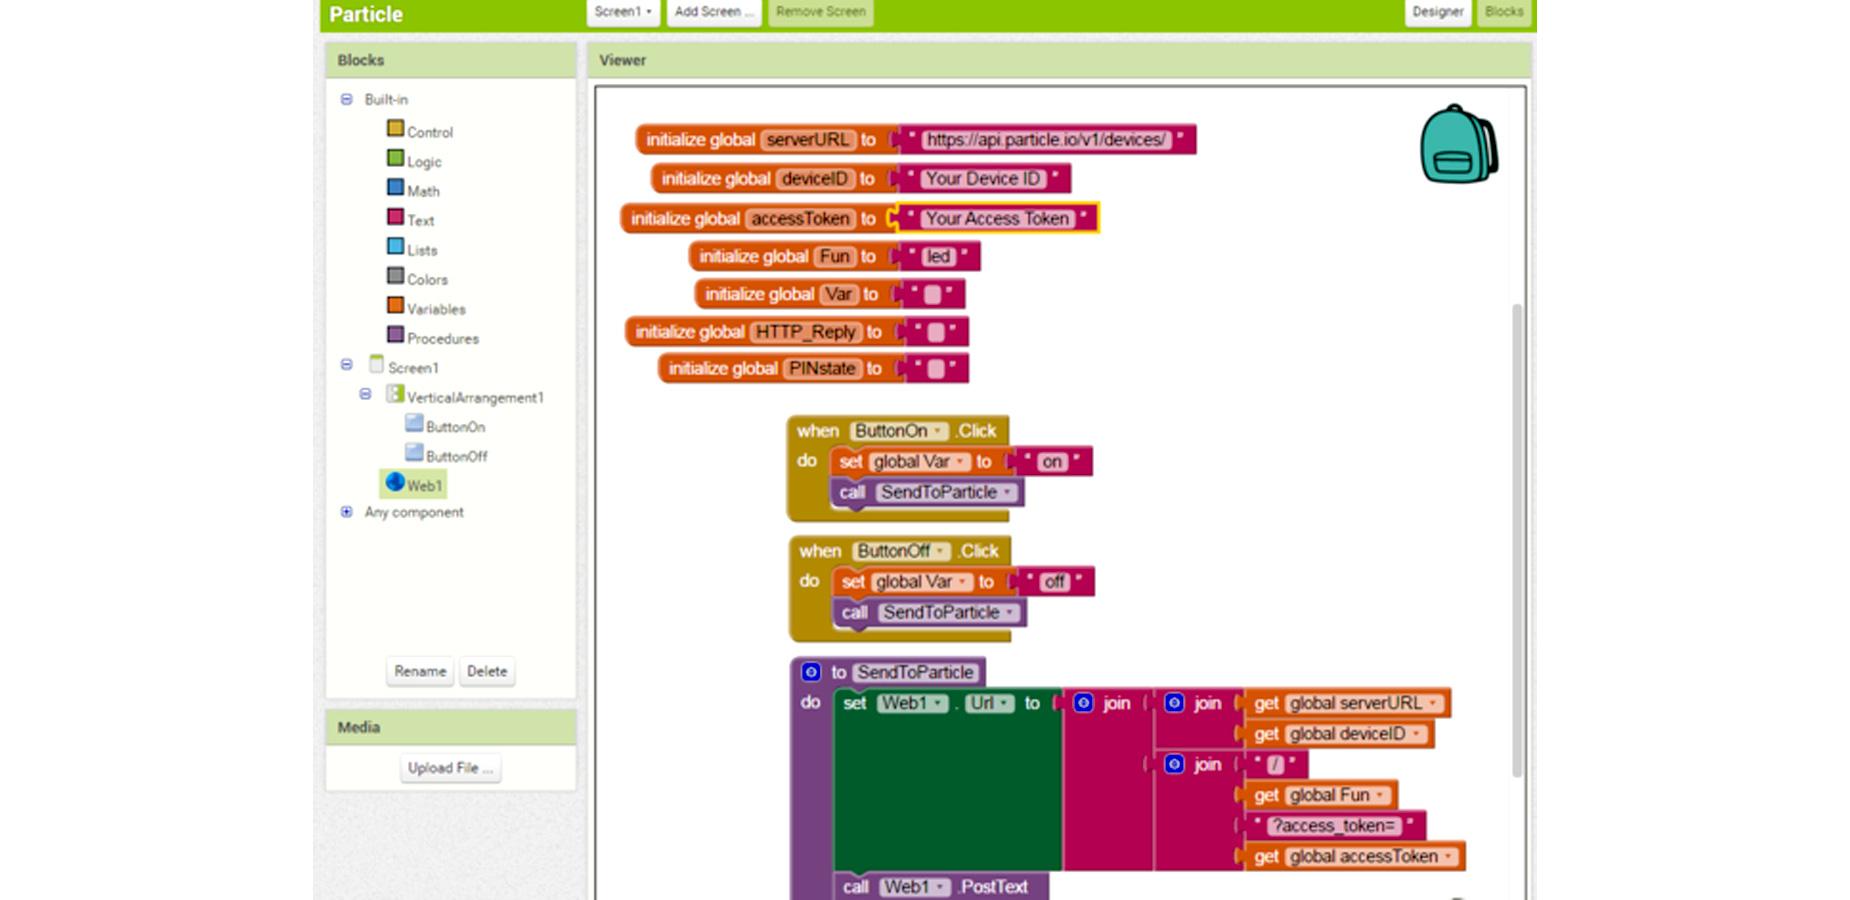 app-development-image-1.jpg